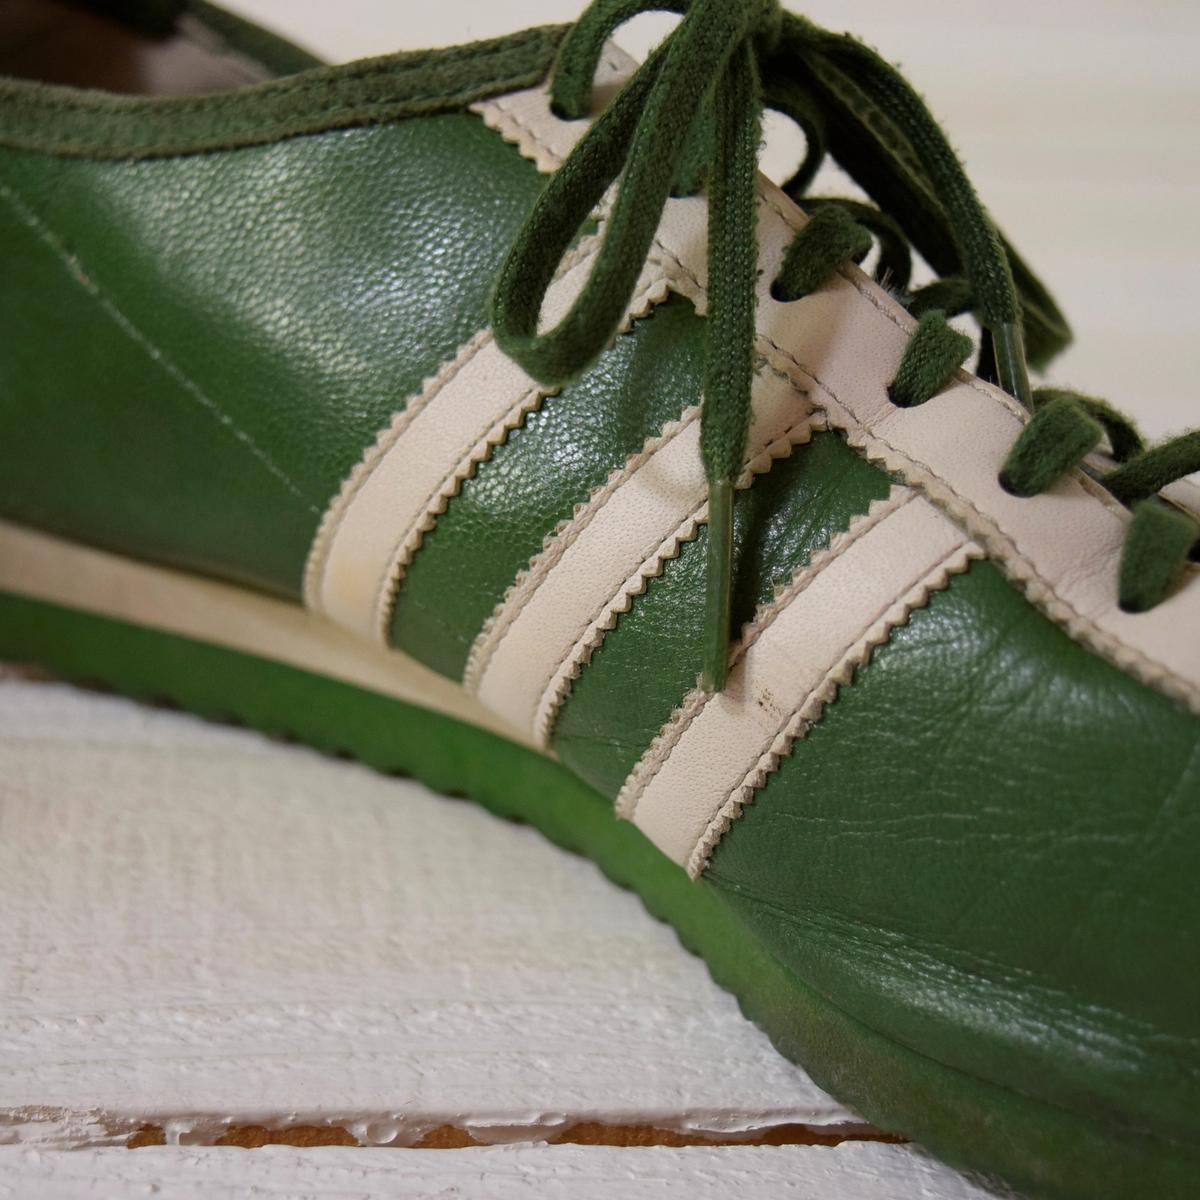 adidas アディダス ITALIA イタリア 26 スニーカー 都市 地名 2003年 復刻 緑 限定カラー_画像6